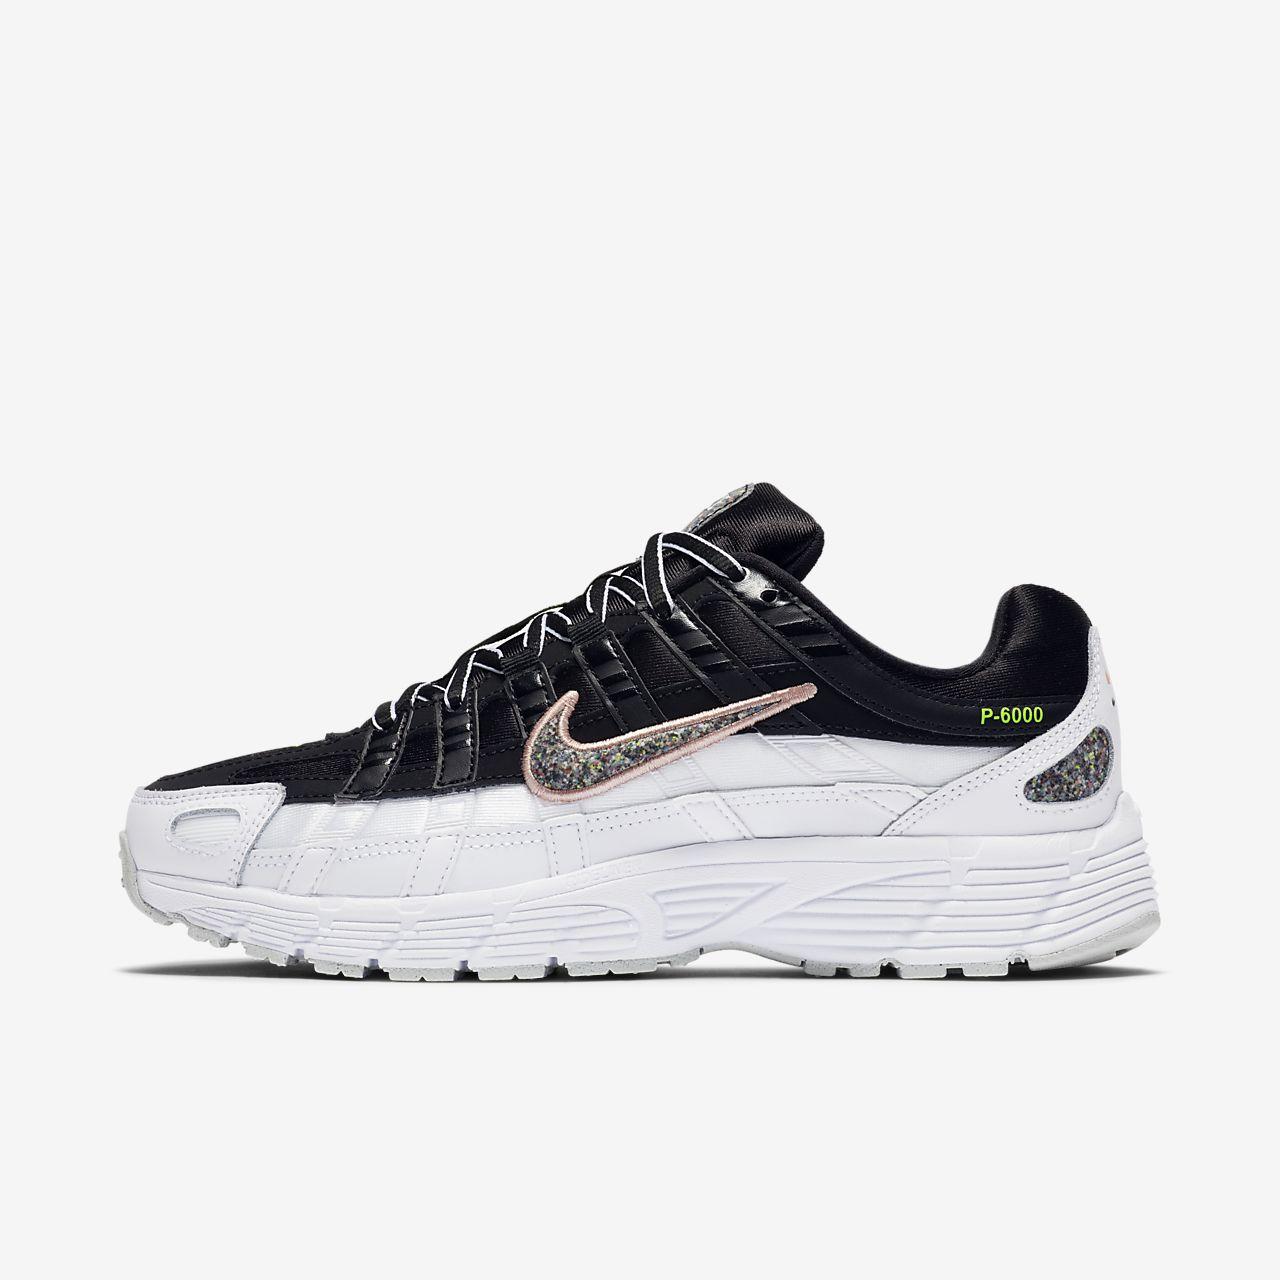 Nike P-6000 SE Women's Shoe